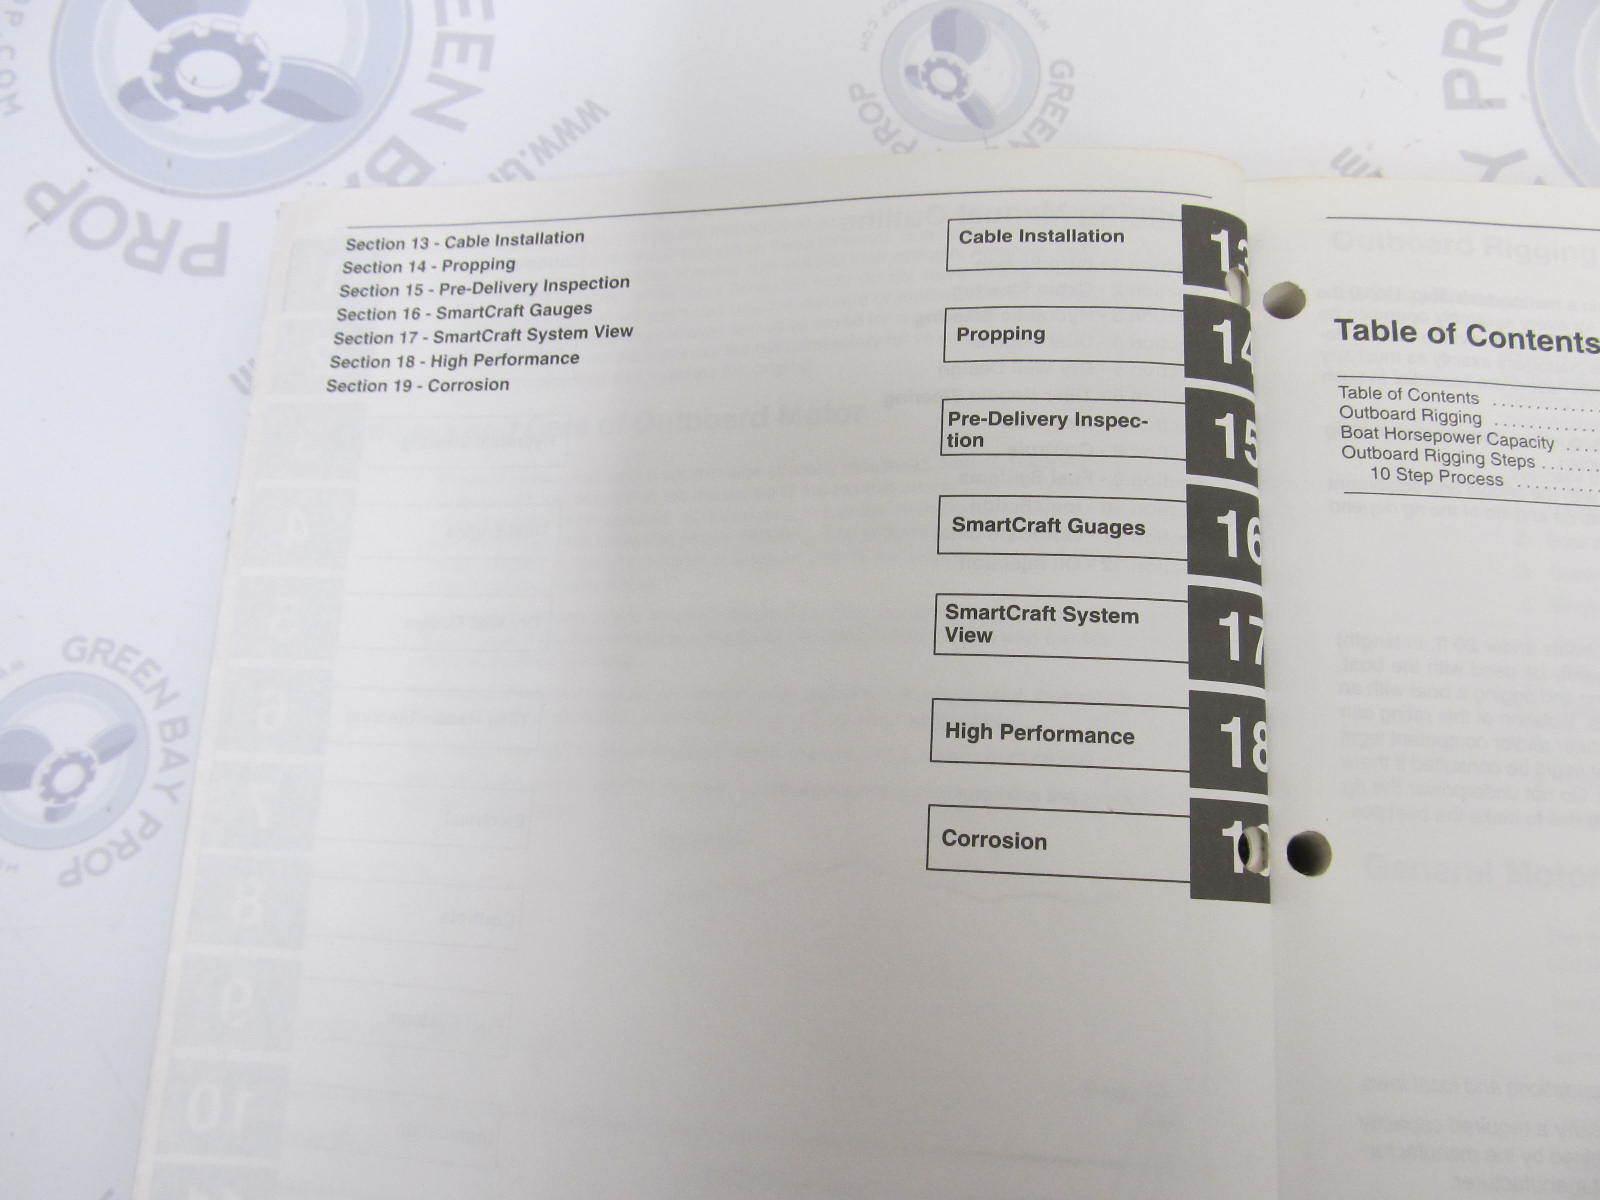 90-881033R2 Mercury Outboard Rigging Technicians Guide Manual 3rd Edition